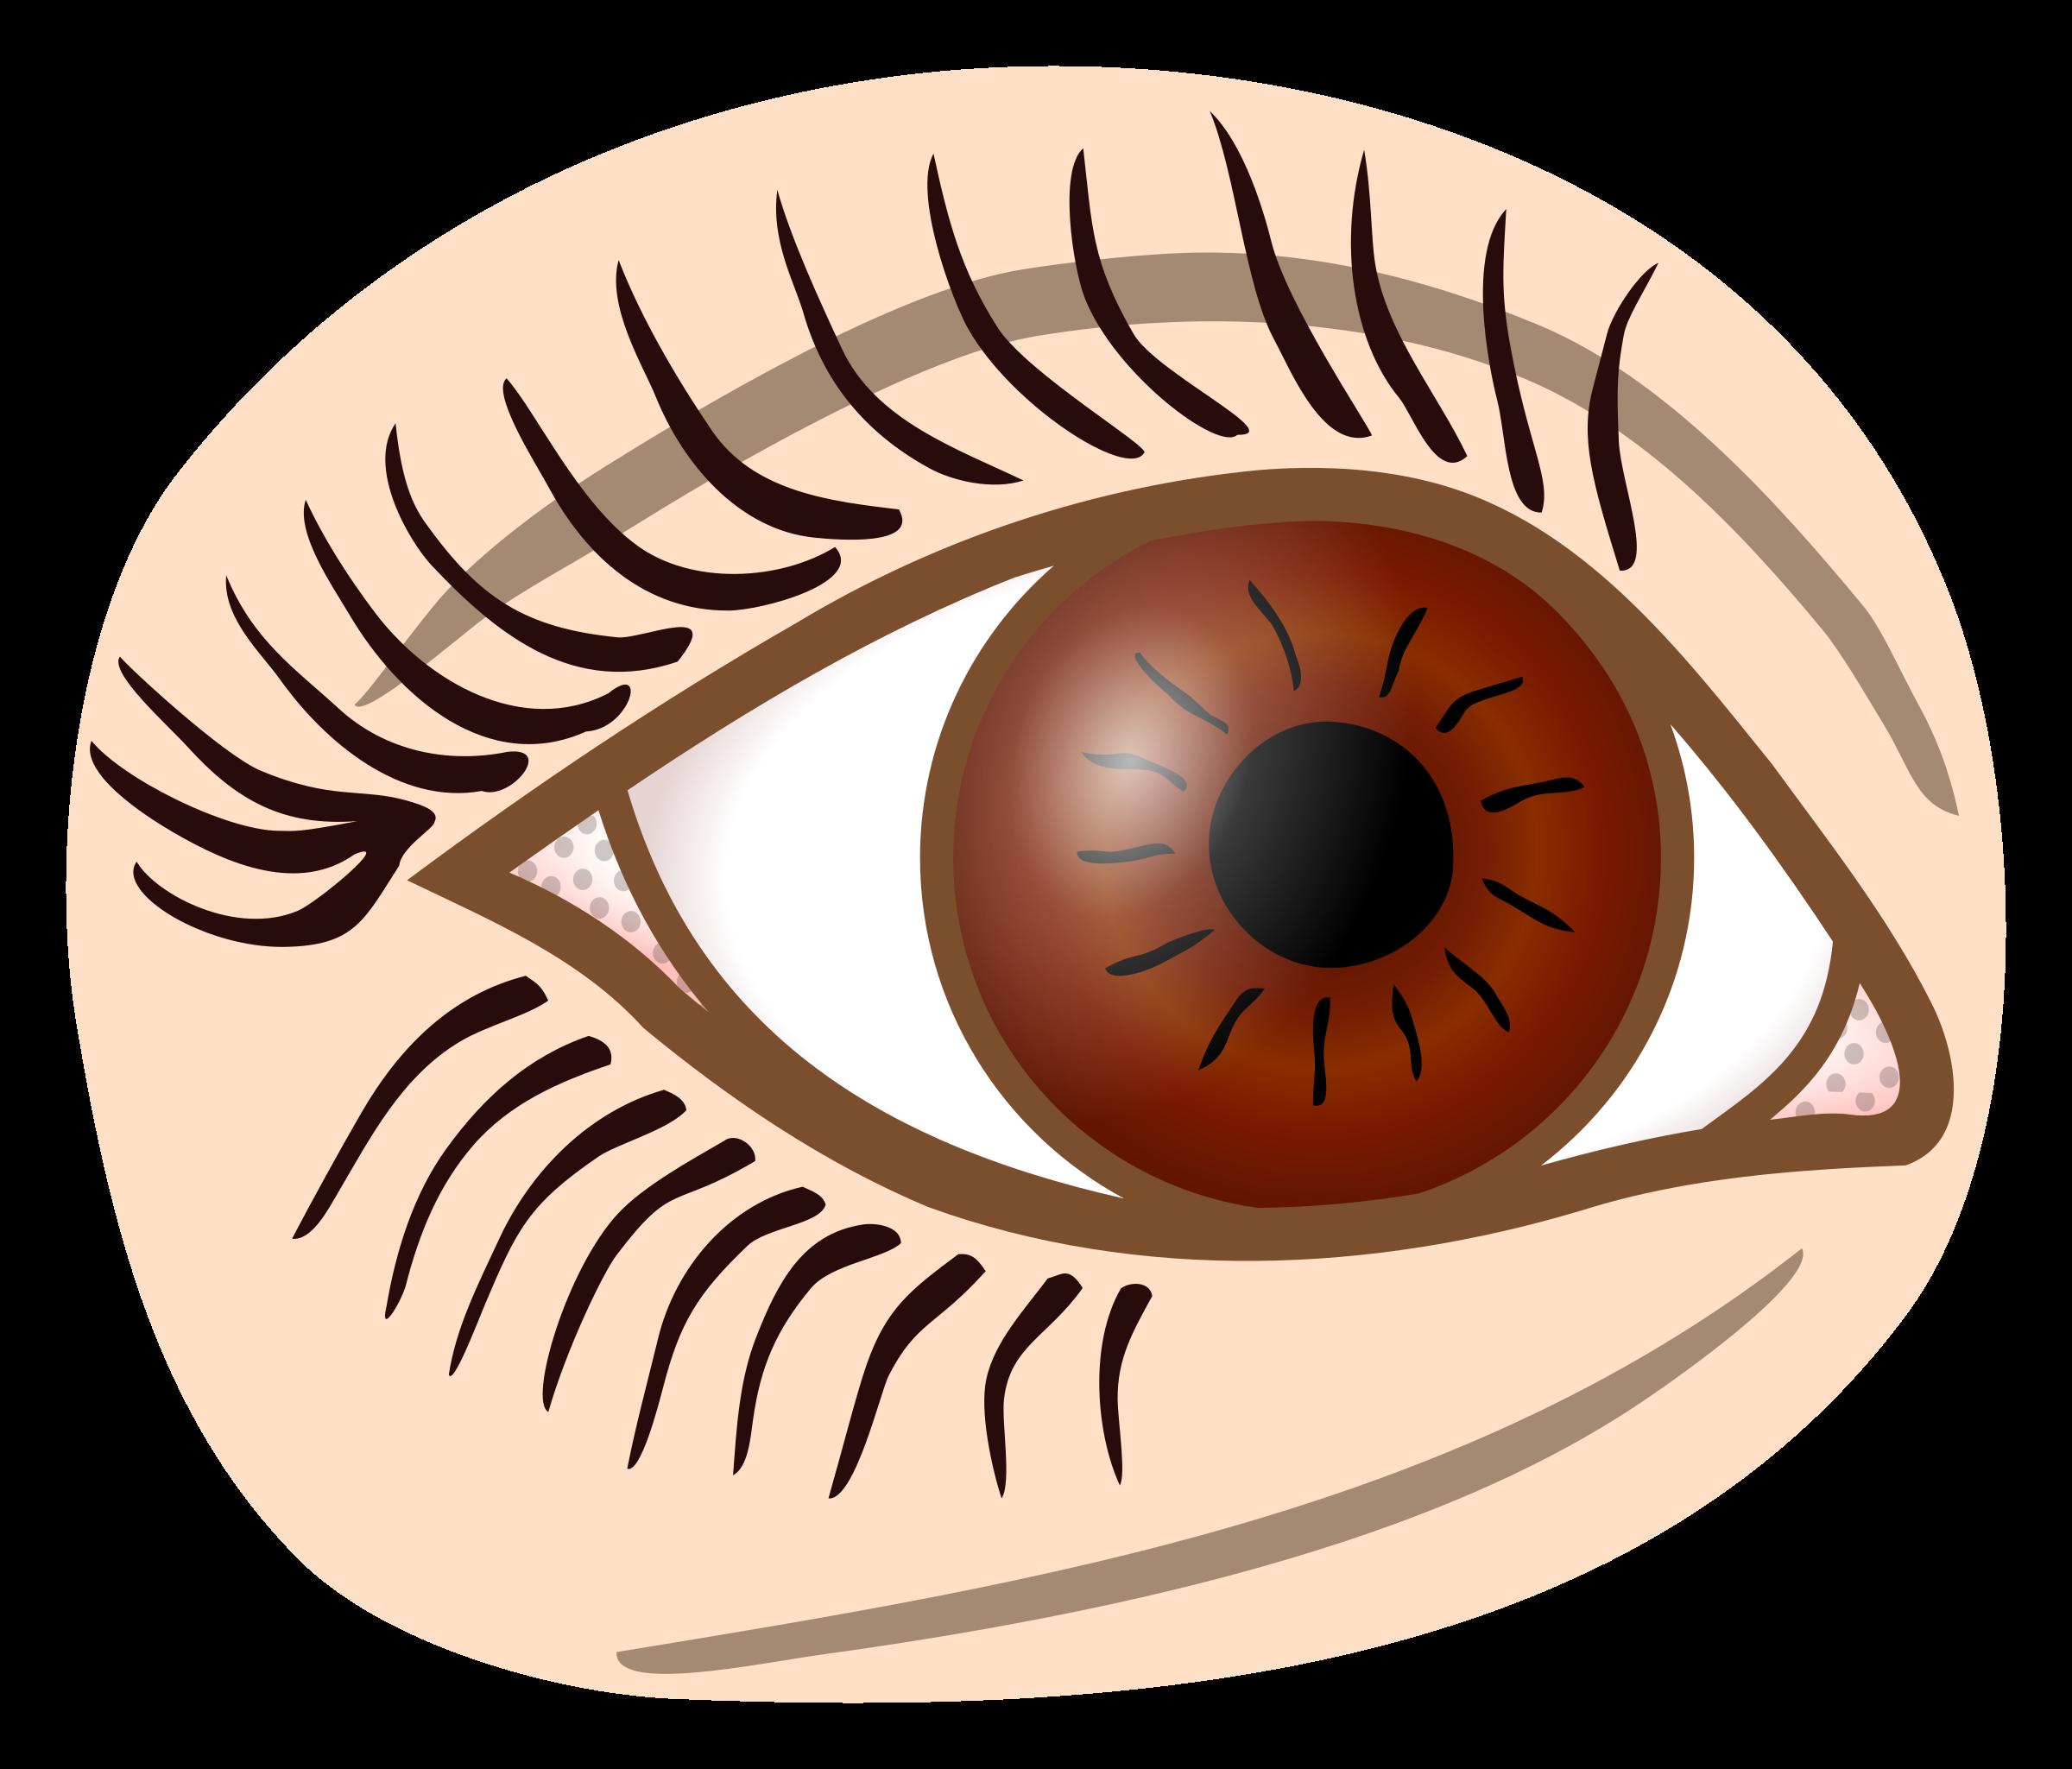 Eyelash clipart printable. Eye coloured icons png